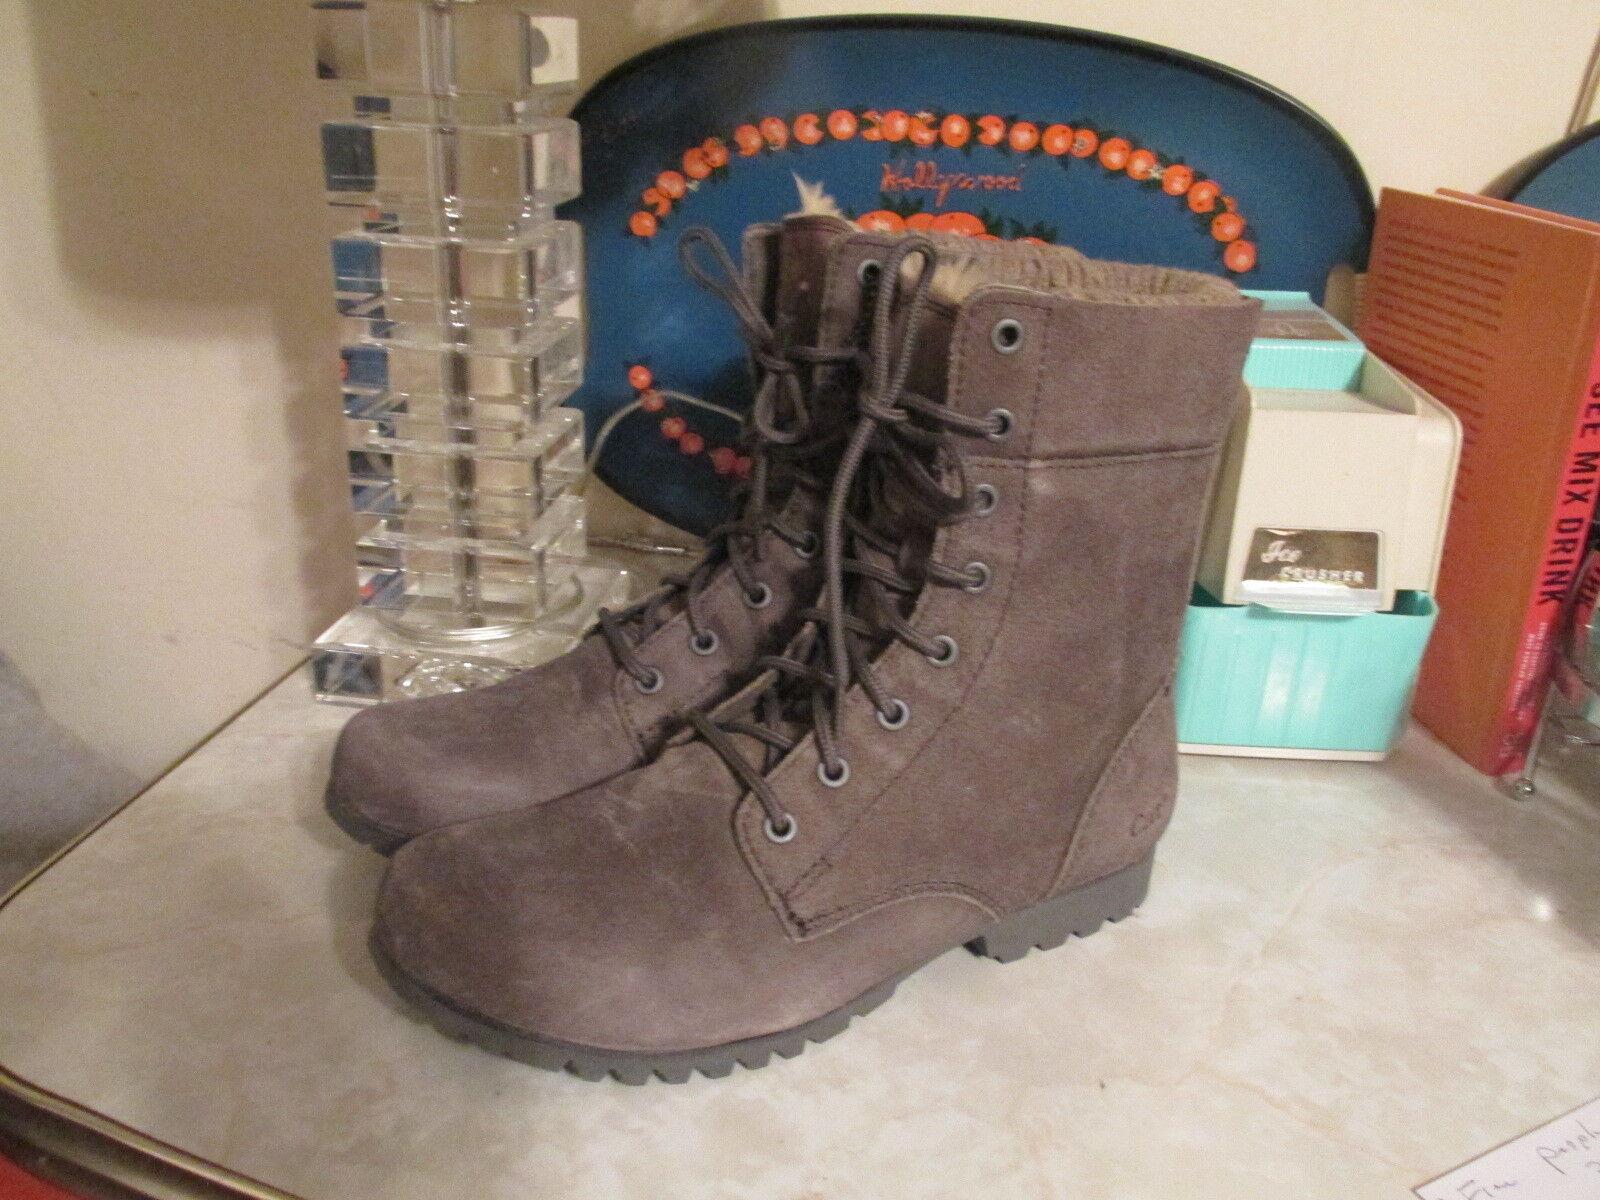 CAT Footwear Alexi Boot faux fur lining Size11 women's P307077 NWOB